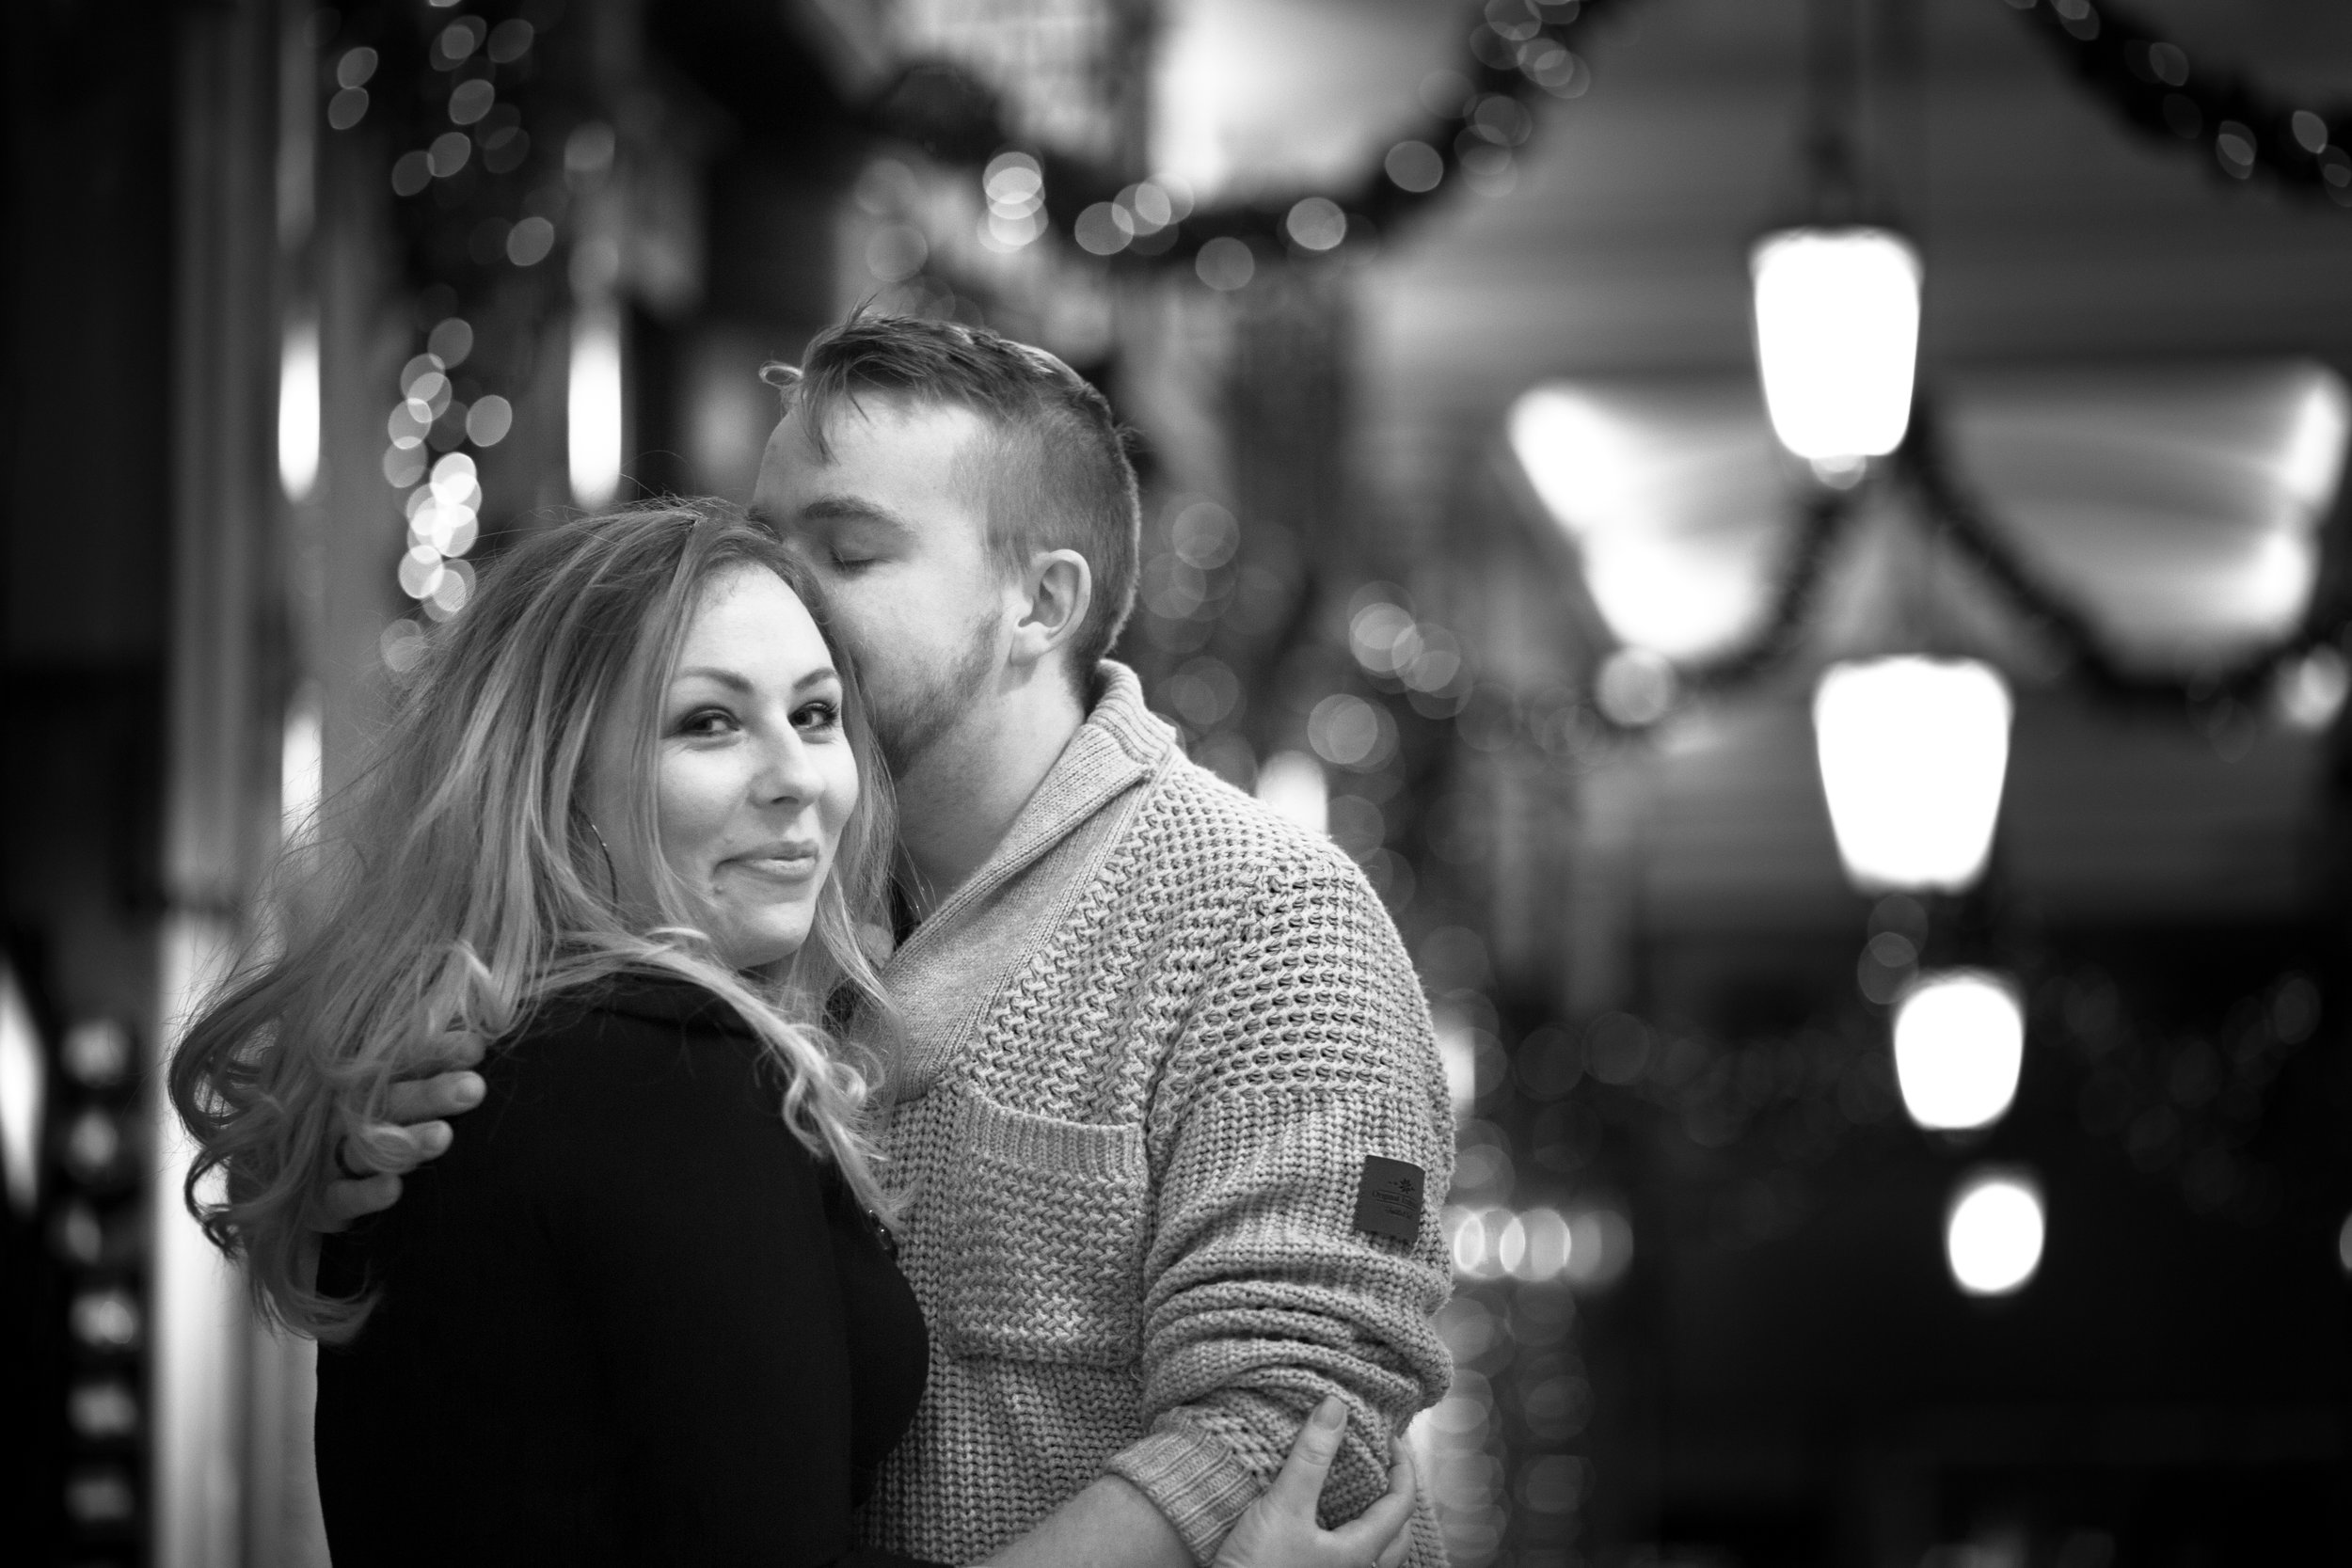 london-oxford-street-christmas-lights-engagement-wedding-photography-09